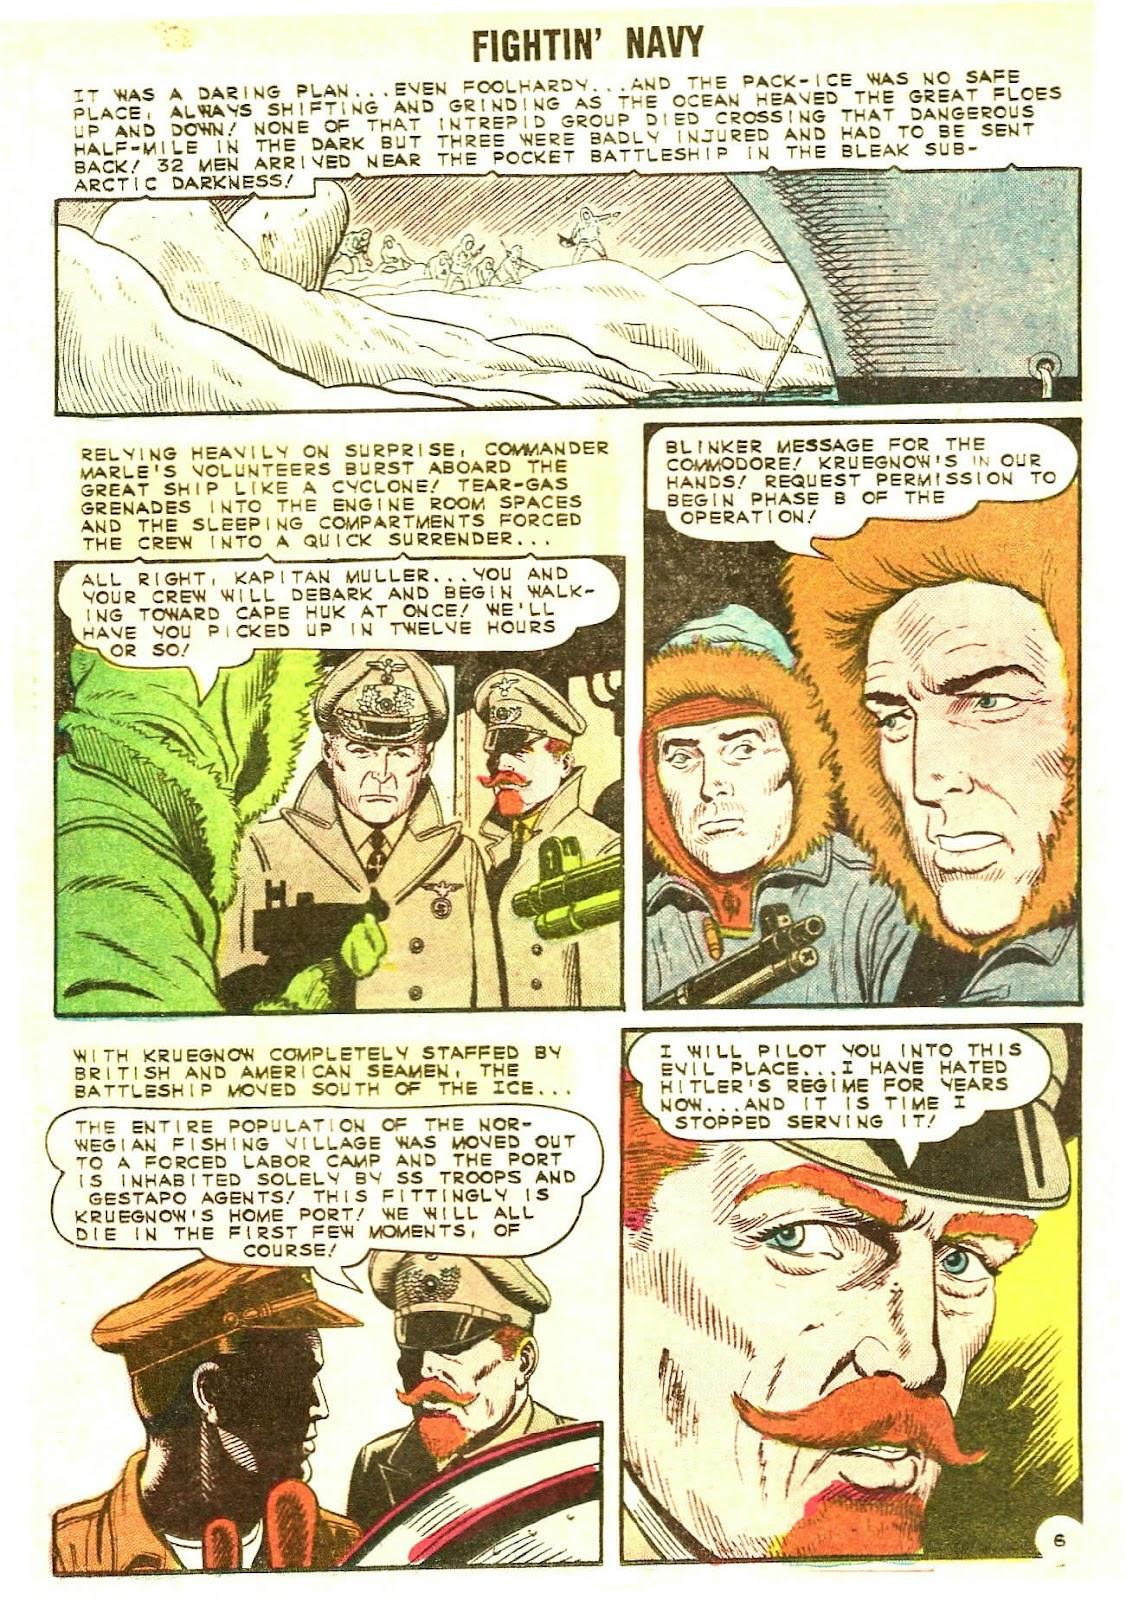 Read online Fightin' Navy comic -  Issue #120 - 20